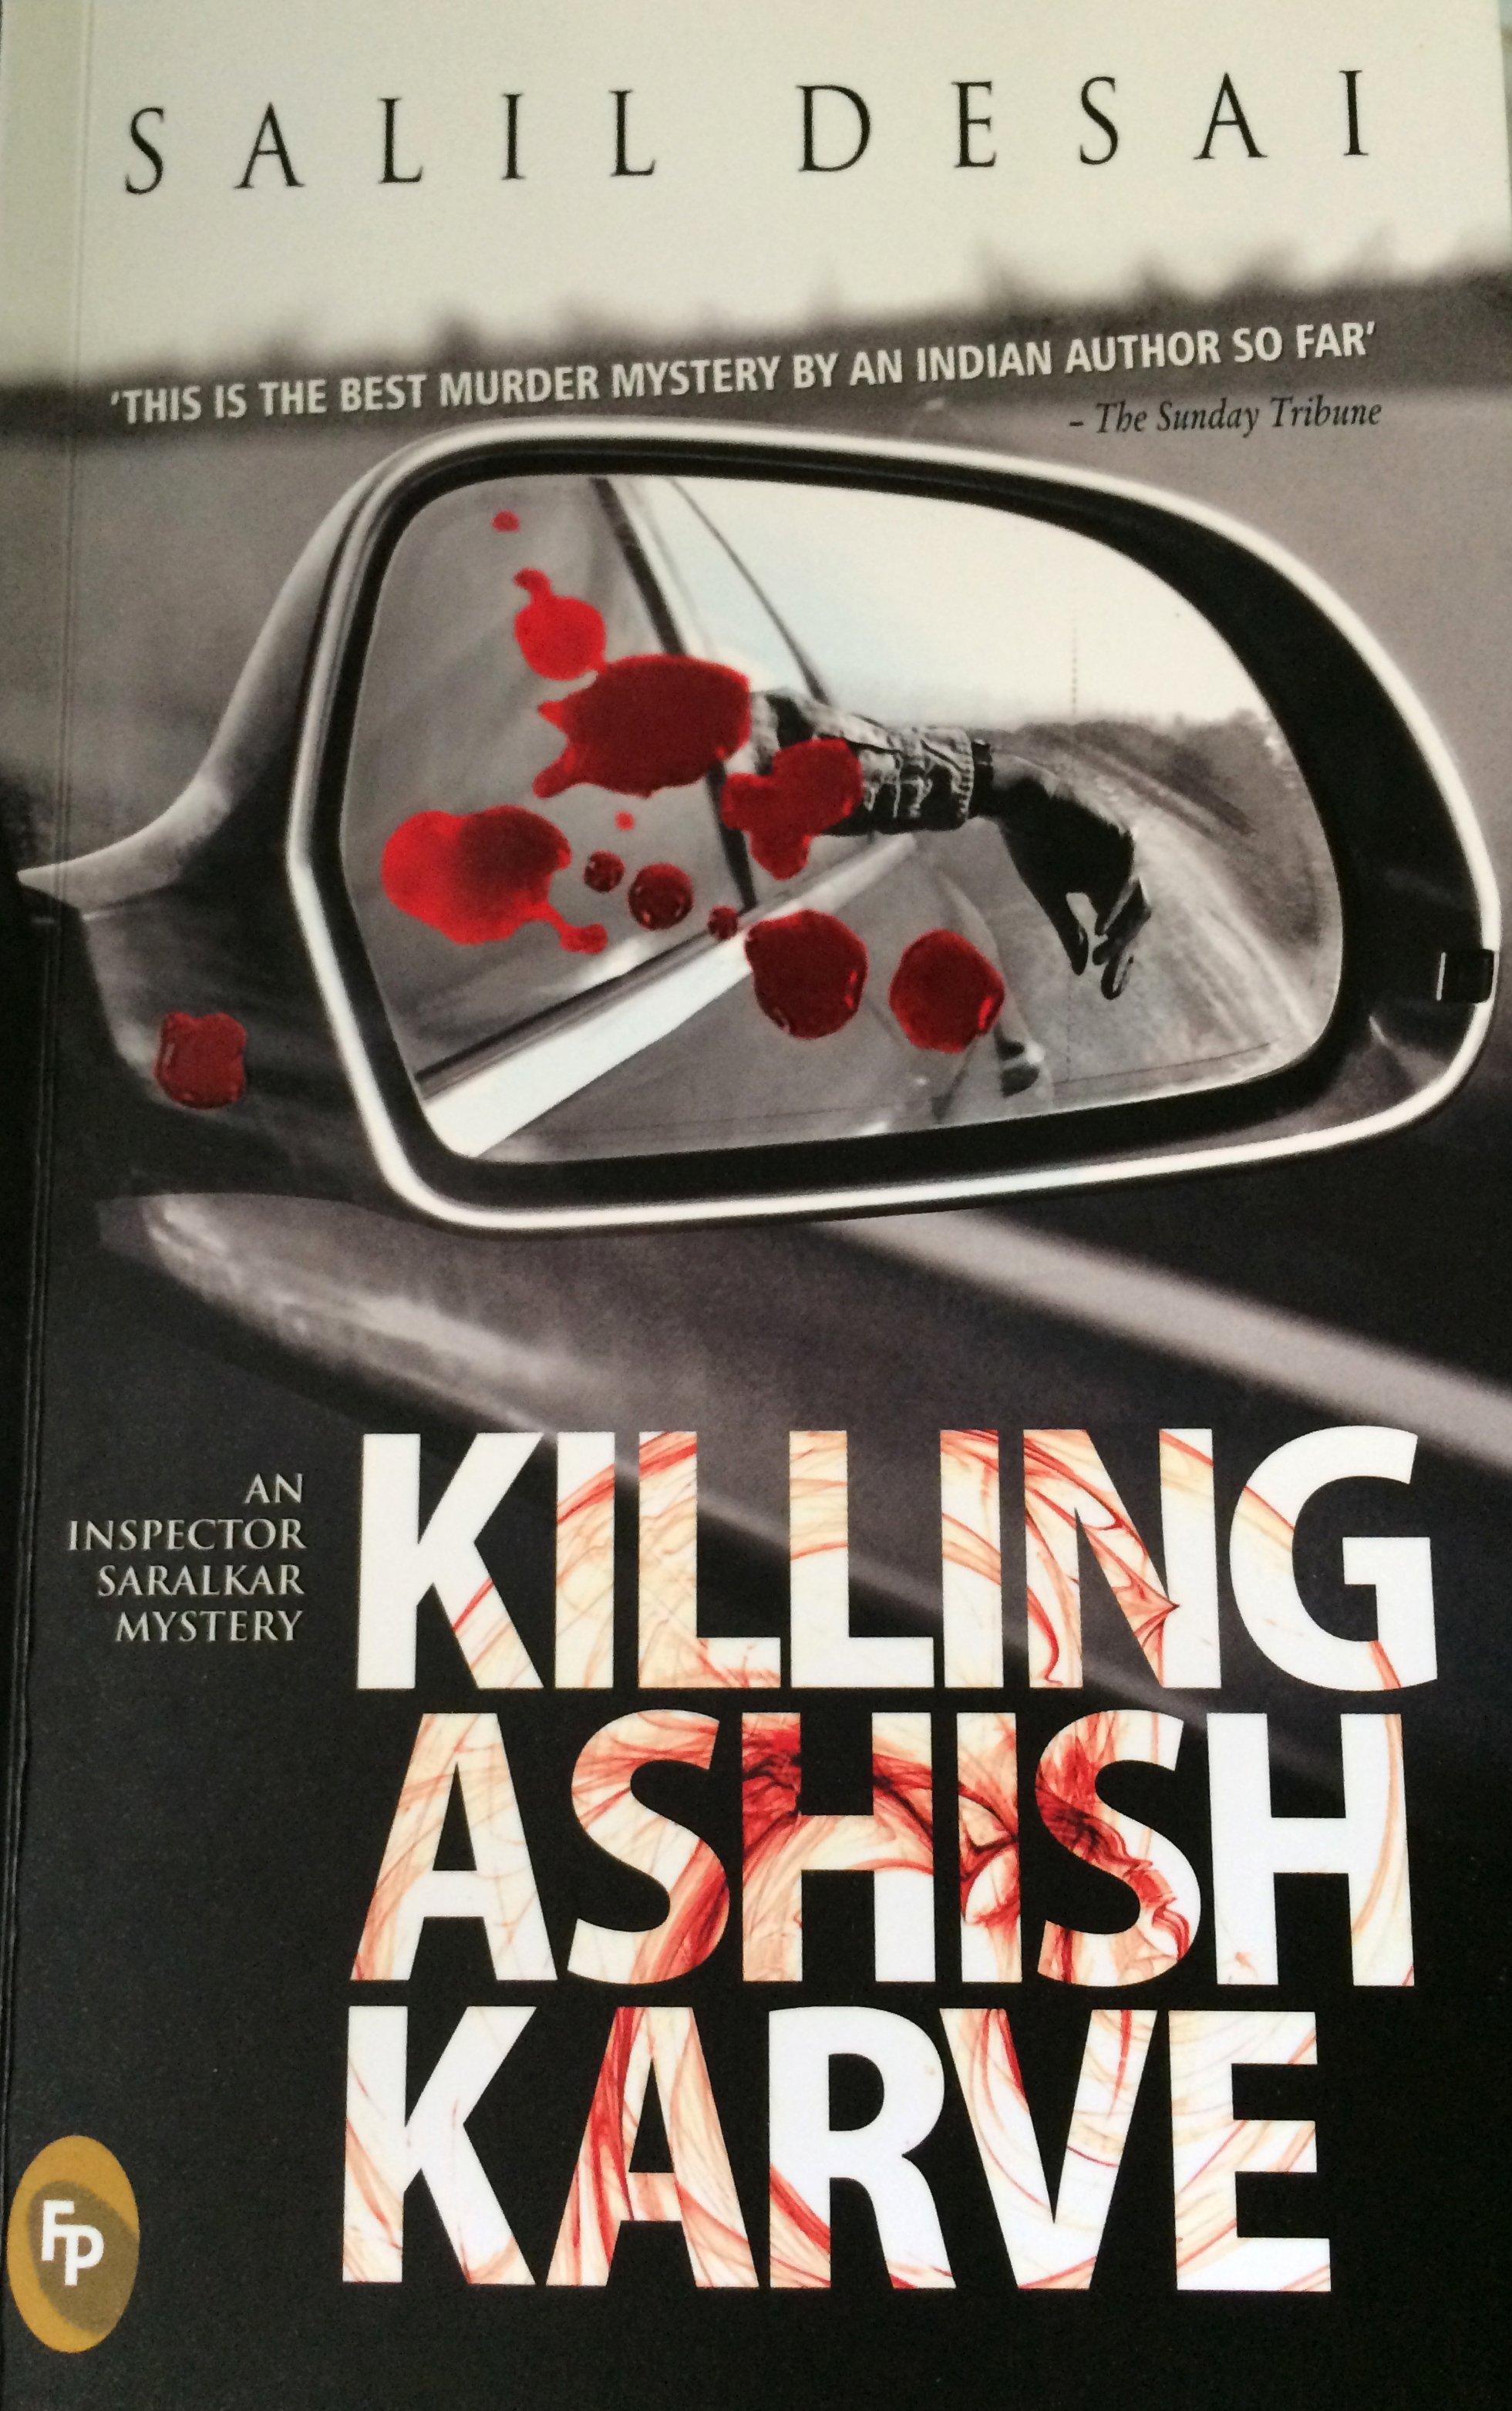 KILLING ASHISH KARVE by SALIL DESAI